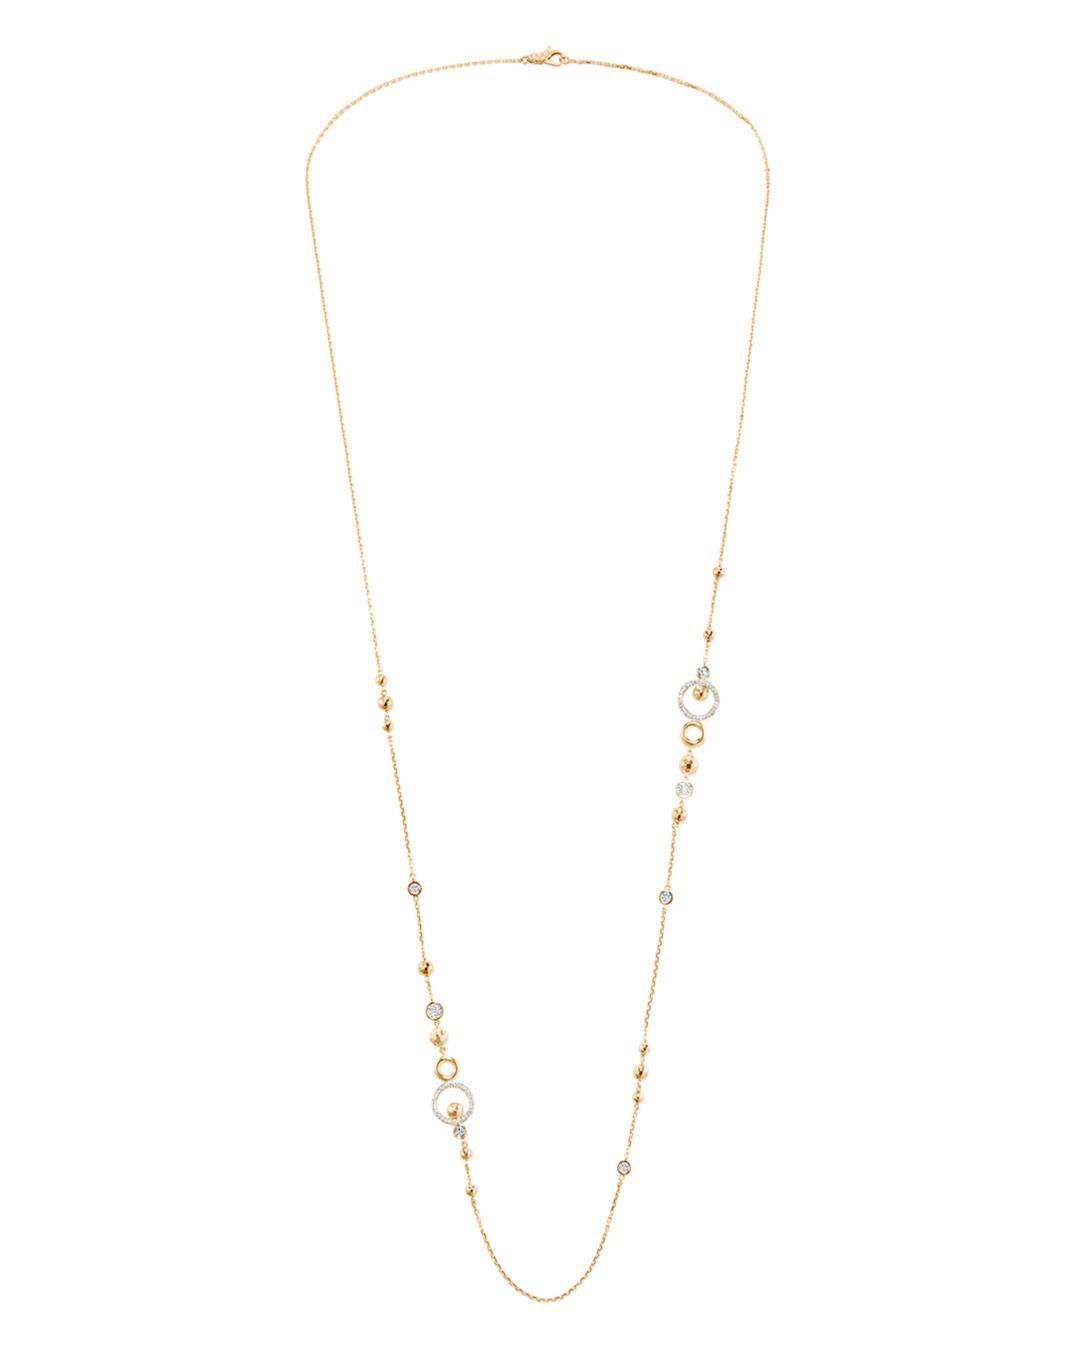 John Hardy 18k Yellow Gold Dot Pavé Diamond Sautoir Chain With Recent Yellow Gold Diamond Sautoir Necklaces (View 4 of 25)